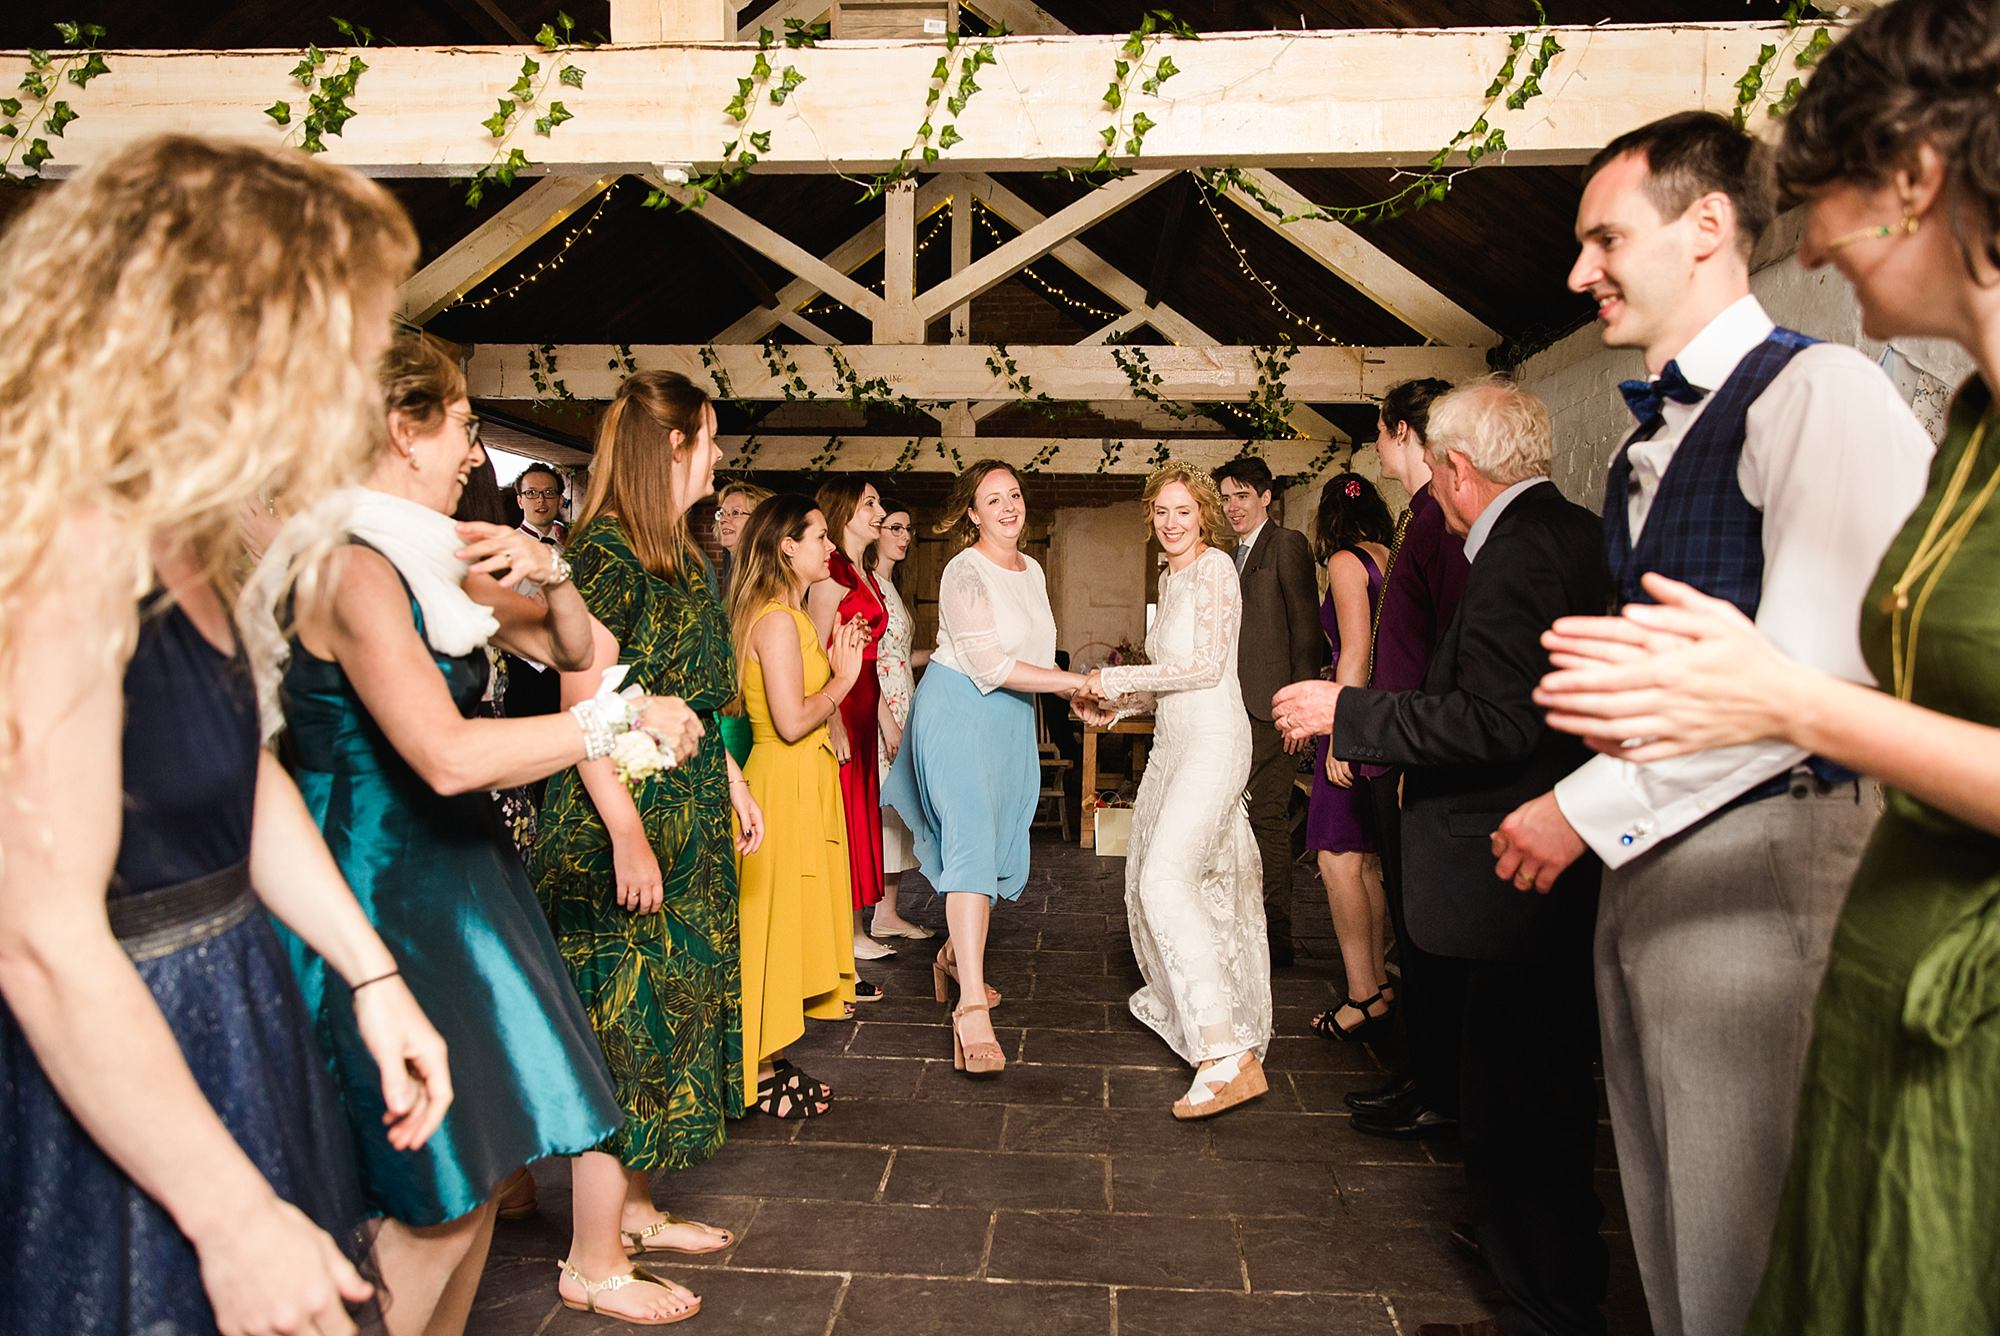 Isis Farmhouse Oxford Wedding bride dances with bridesmaid in ceilidh